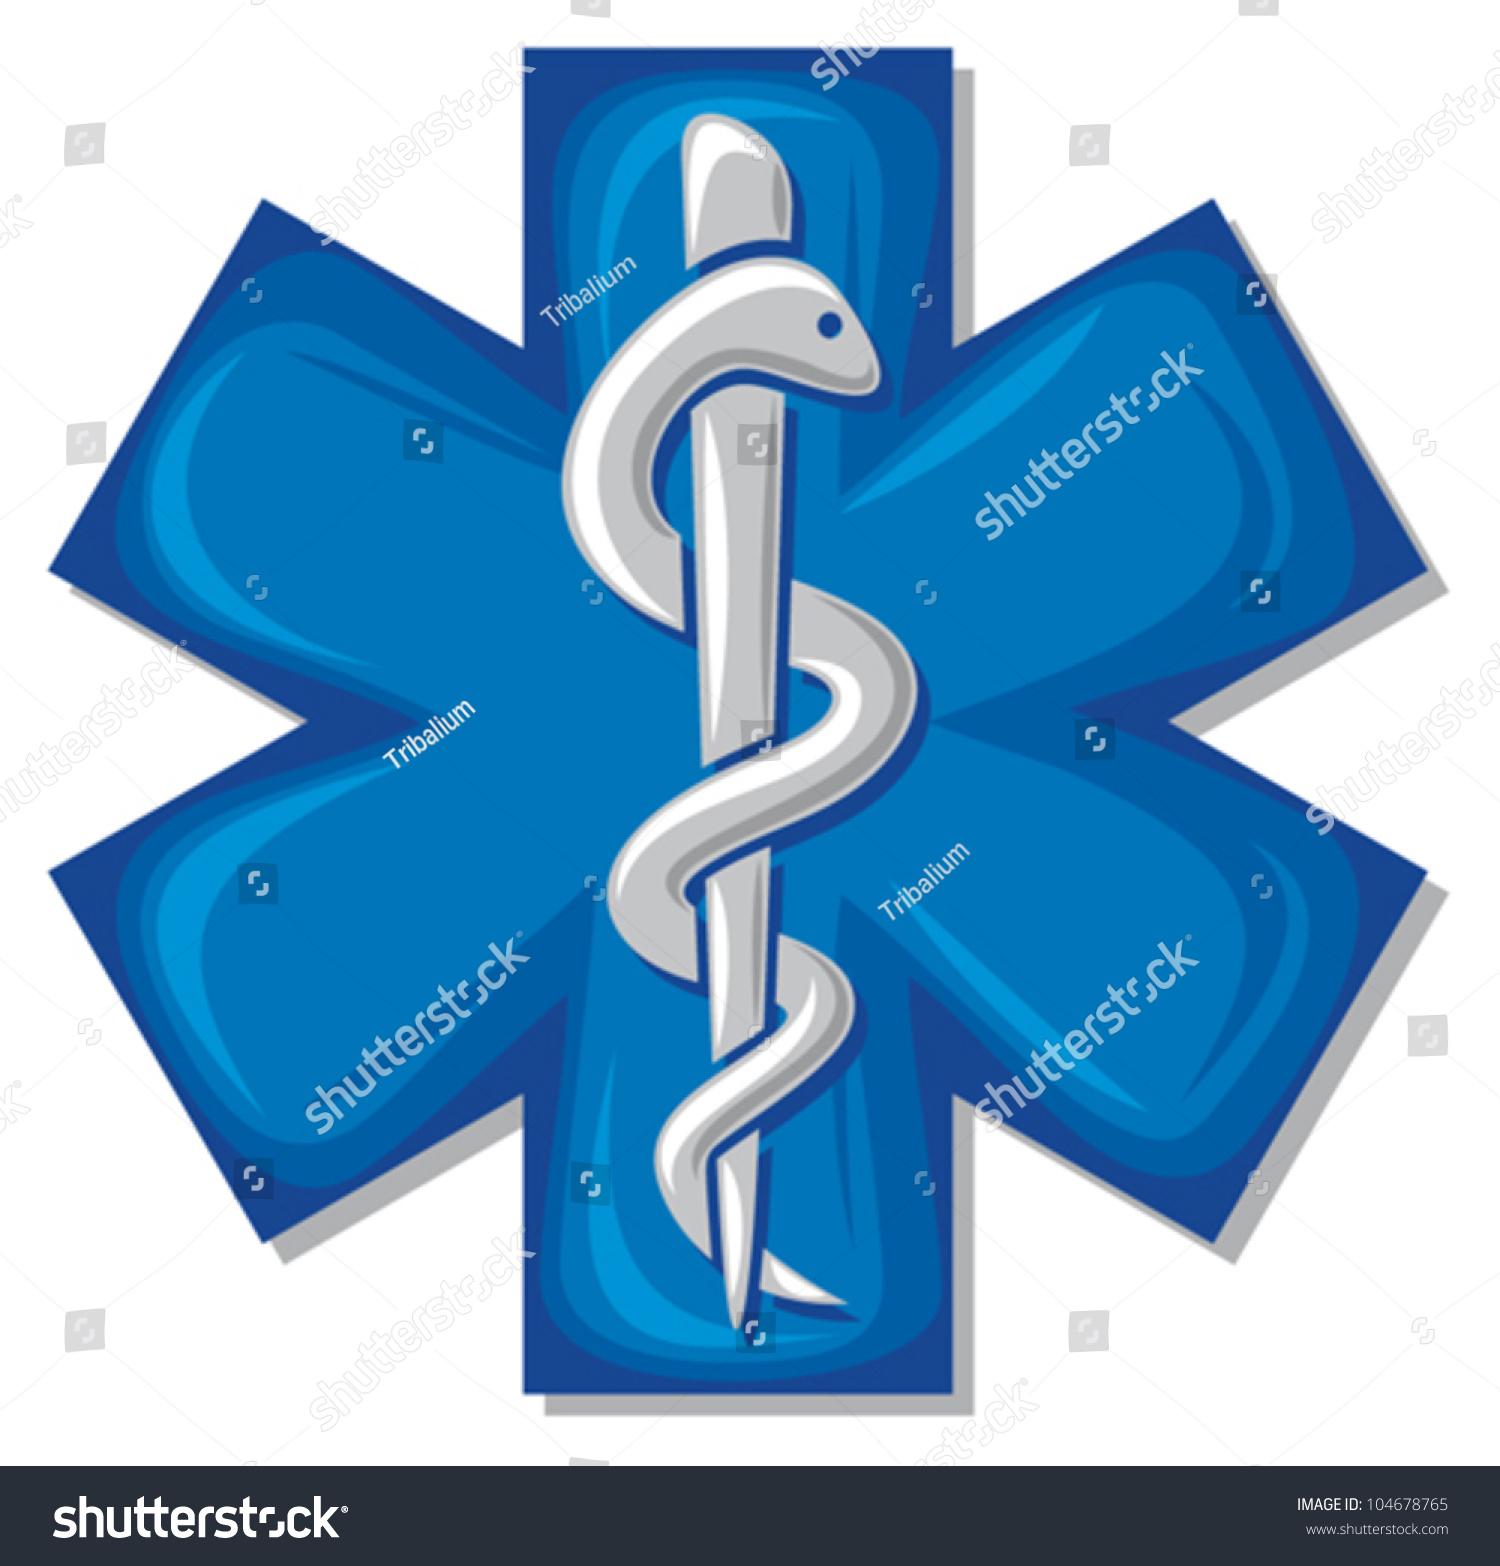 Medical Symbol Caduceus Snake Stick Emblem Stock Vector Royalty